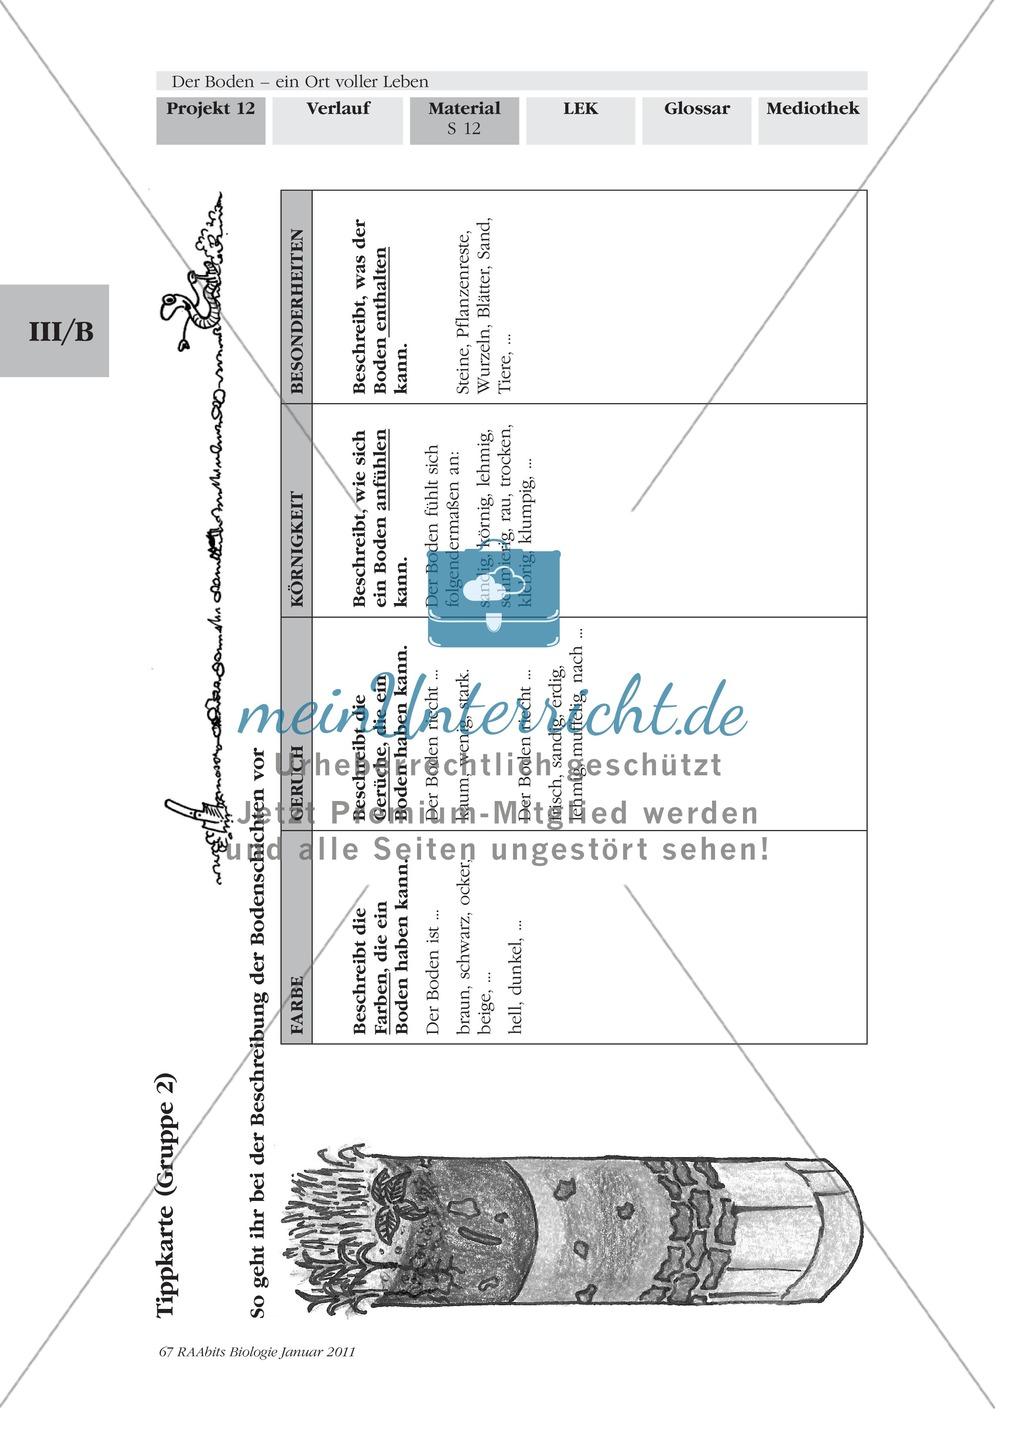 Bodenprofil: Beschaffenheit des Bodens, Bodenschichten, Exkursion, Präsentation Preview 3